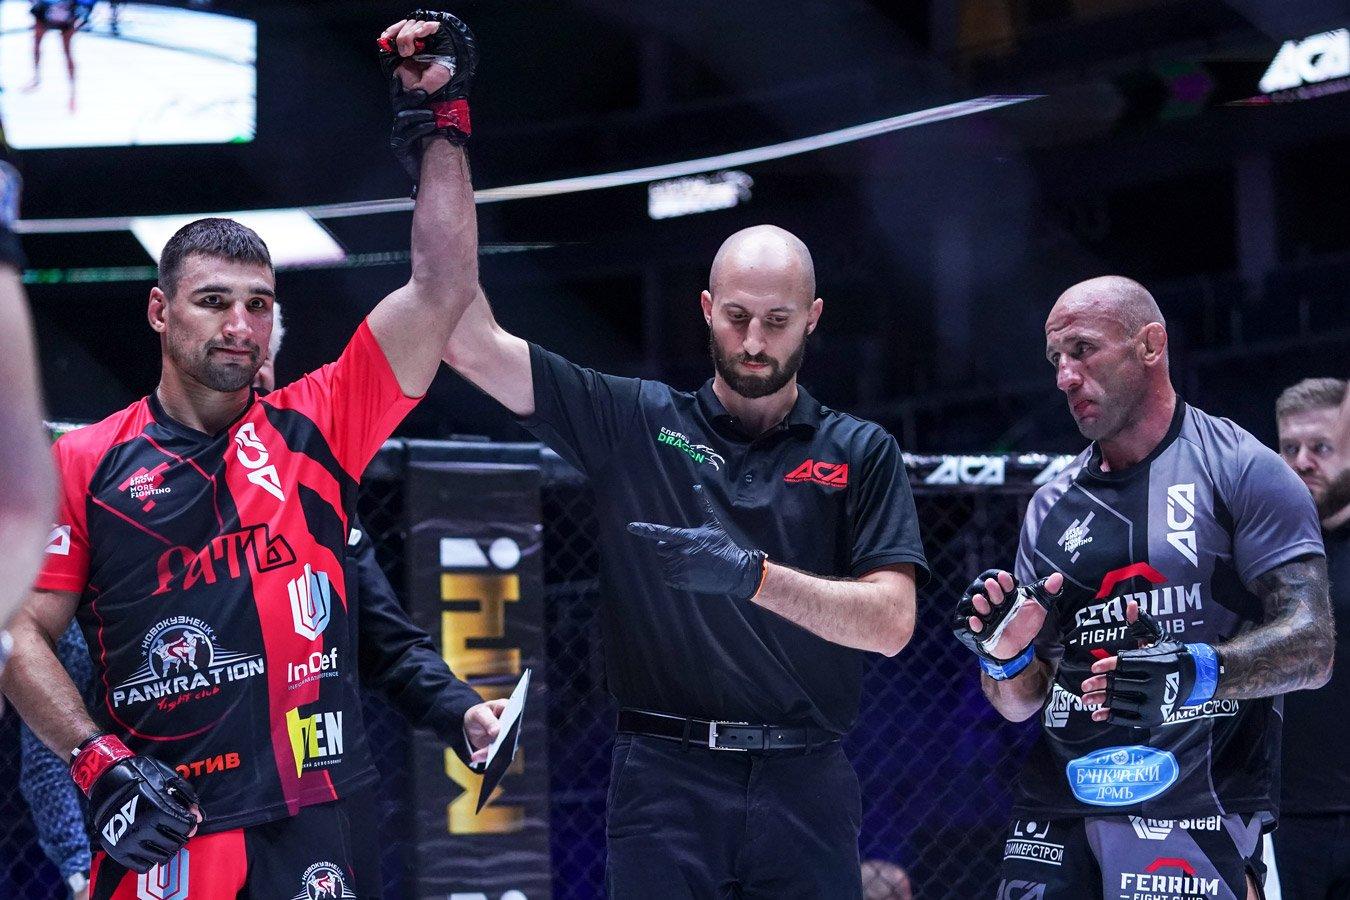 Кошкин нокаутировал Бутенко, Лопесу разбили лицо в кровь. Фото турнира АСА 123